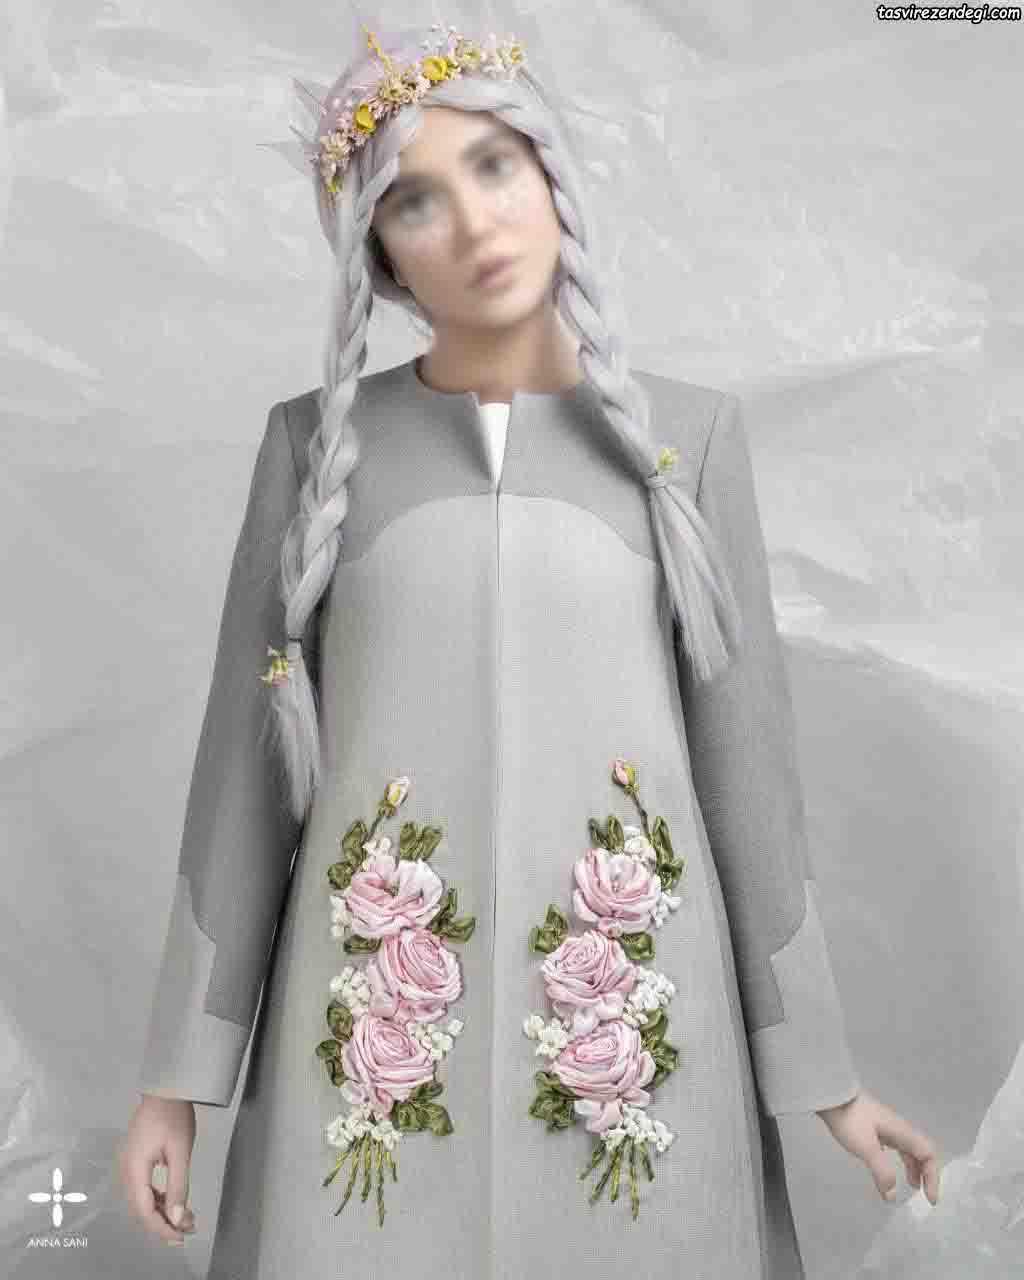 مدل مانتو عید , مانتو مجلسی جدید و شیک